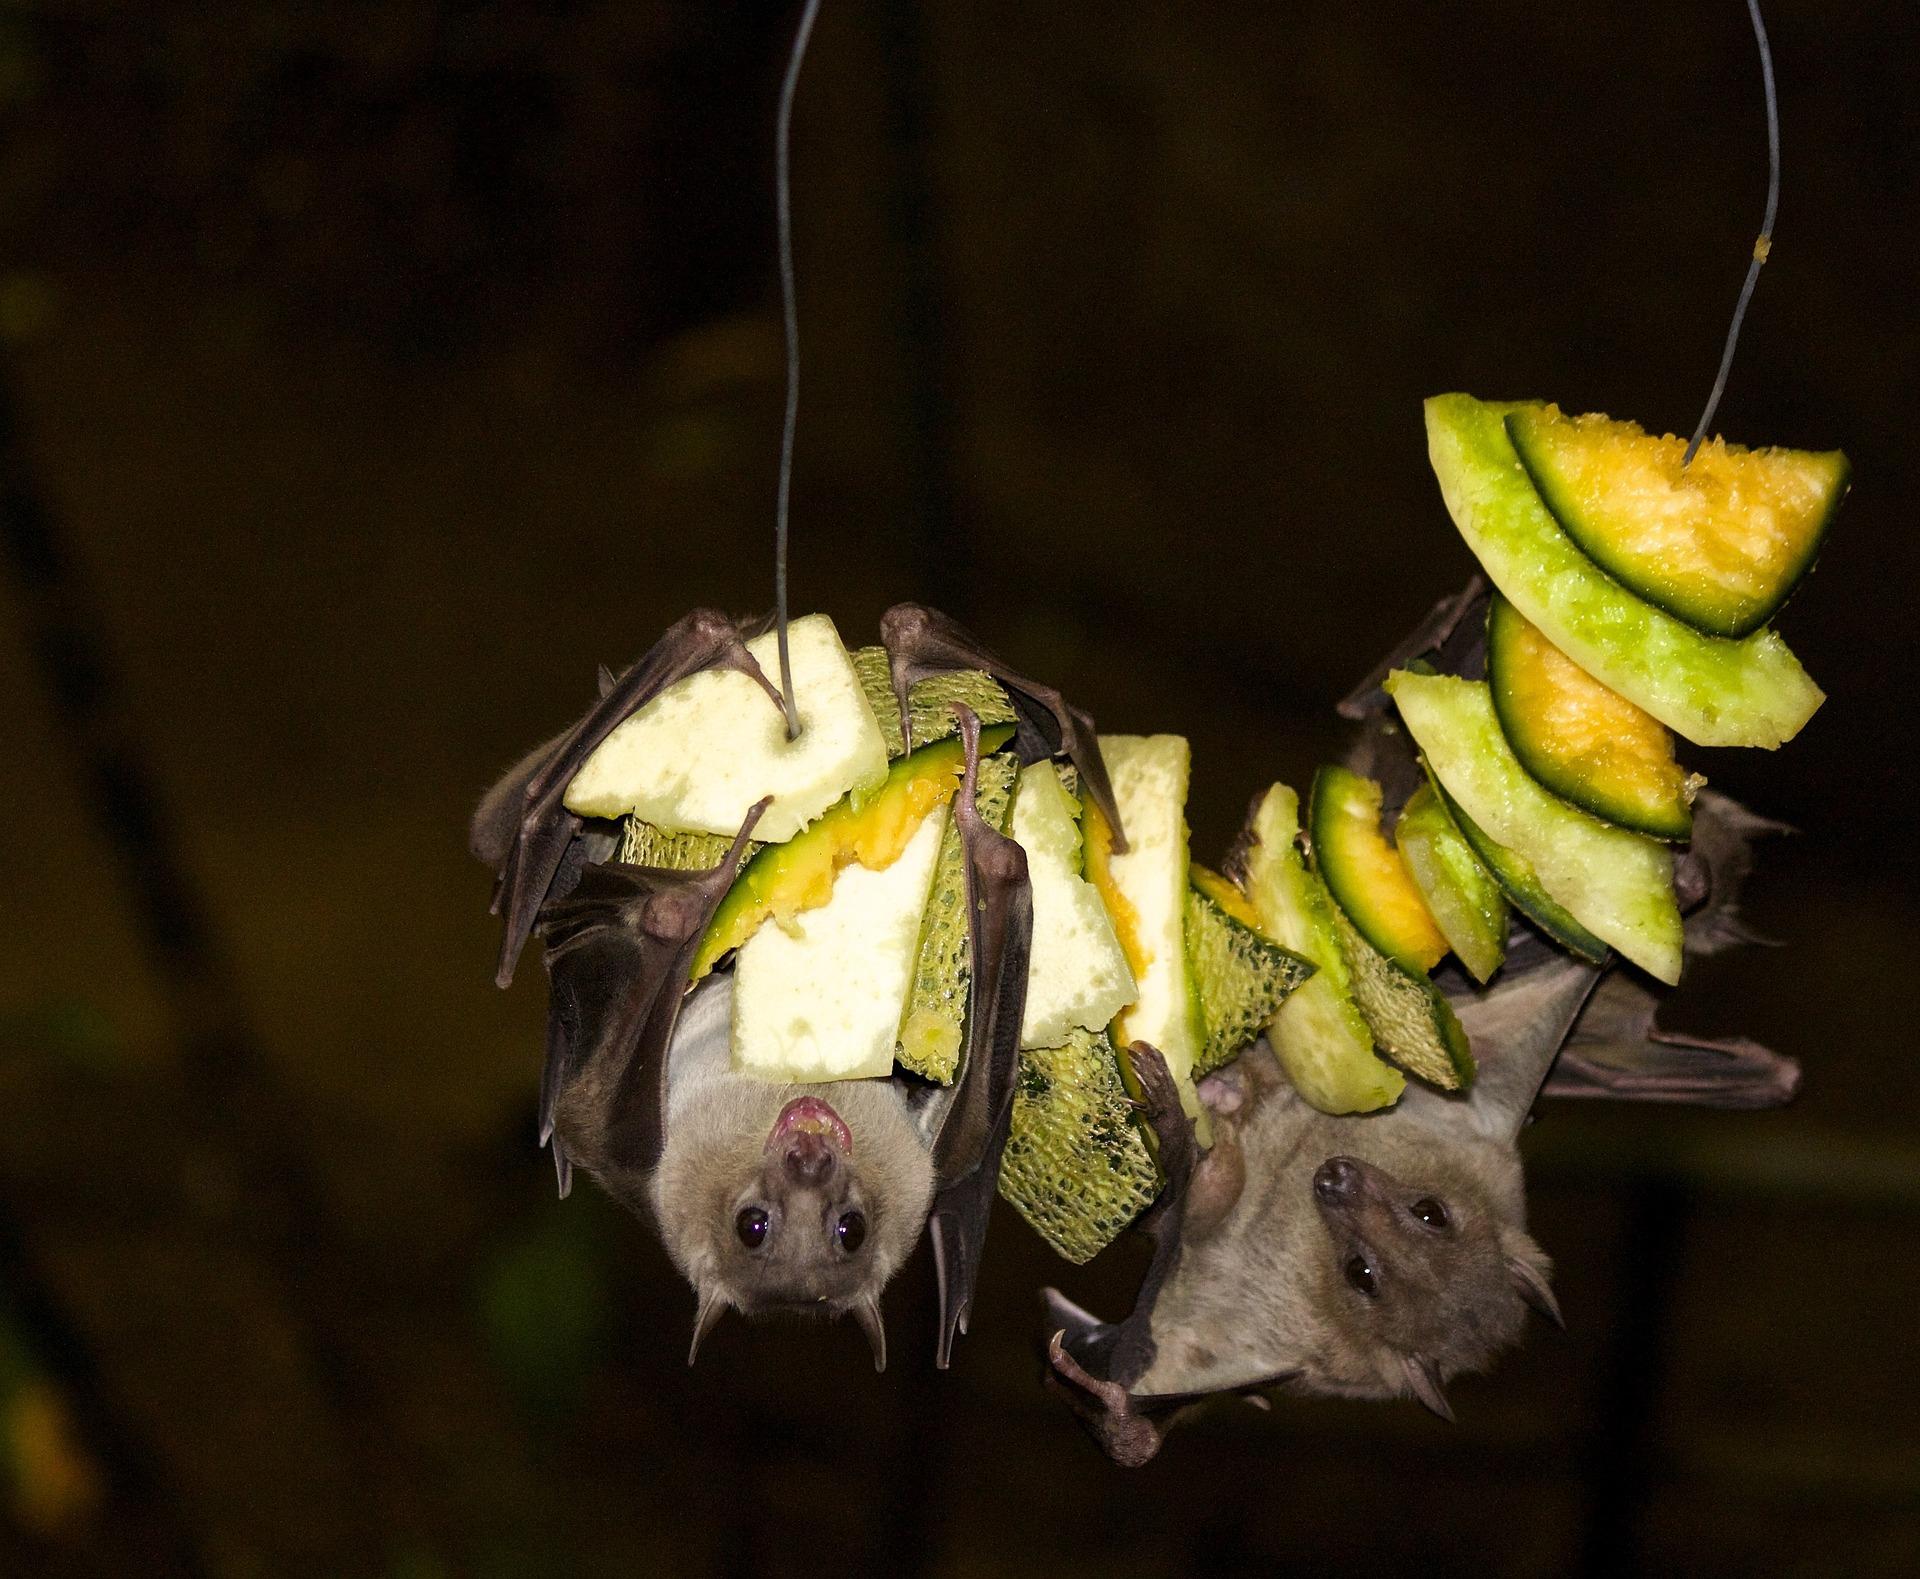 Fruit Bat Feeding, Fruit Bat Diet, Megabat Diet